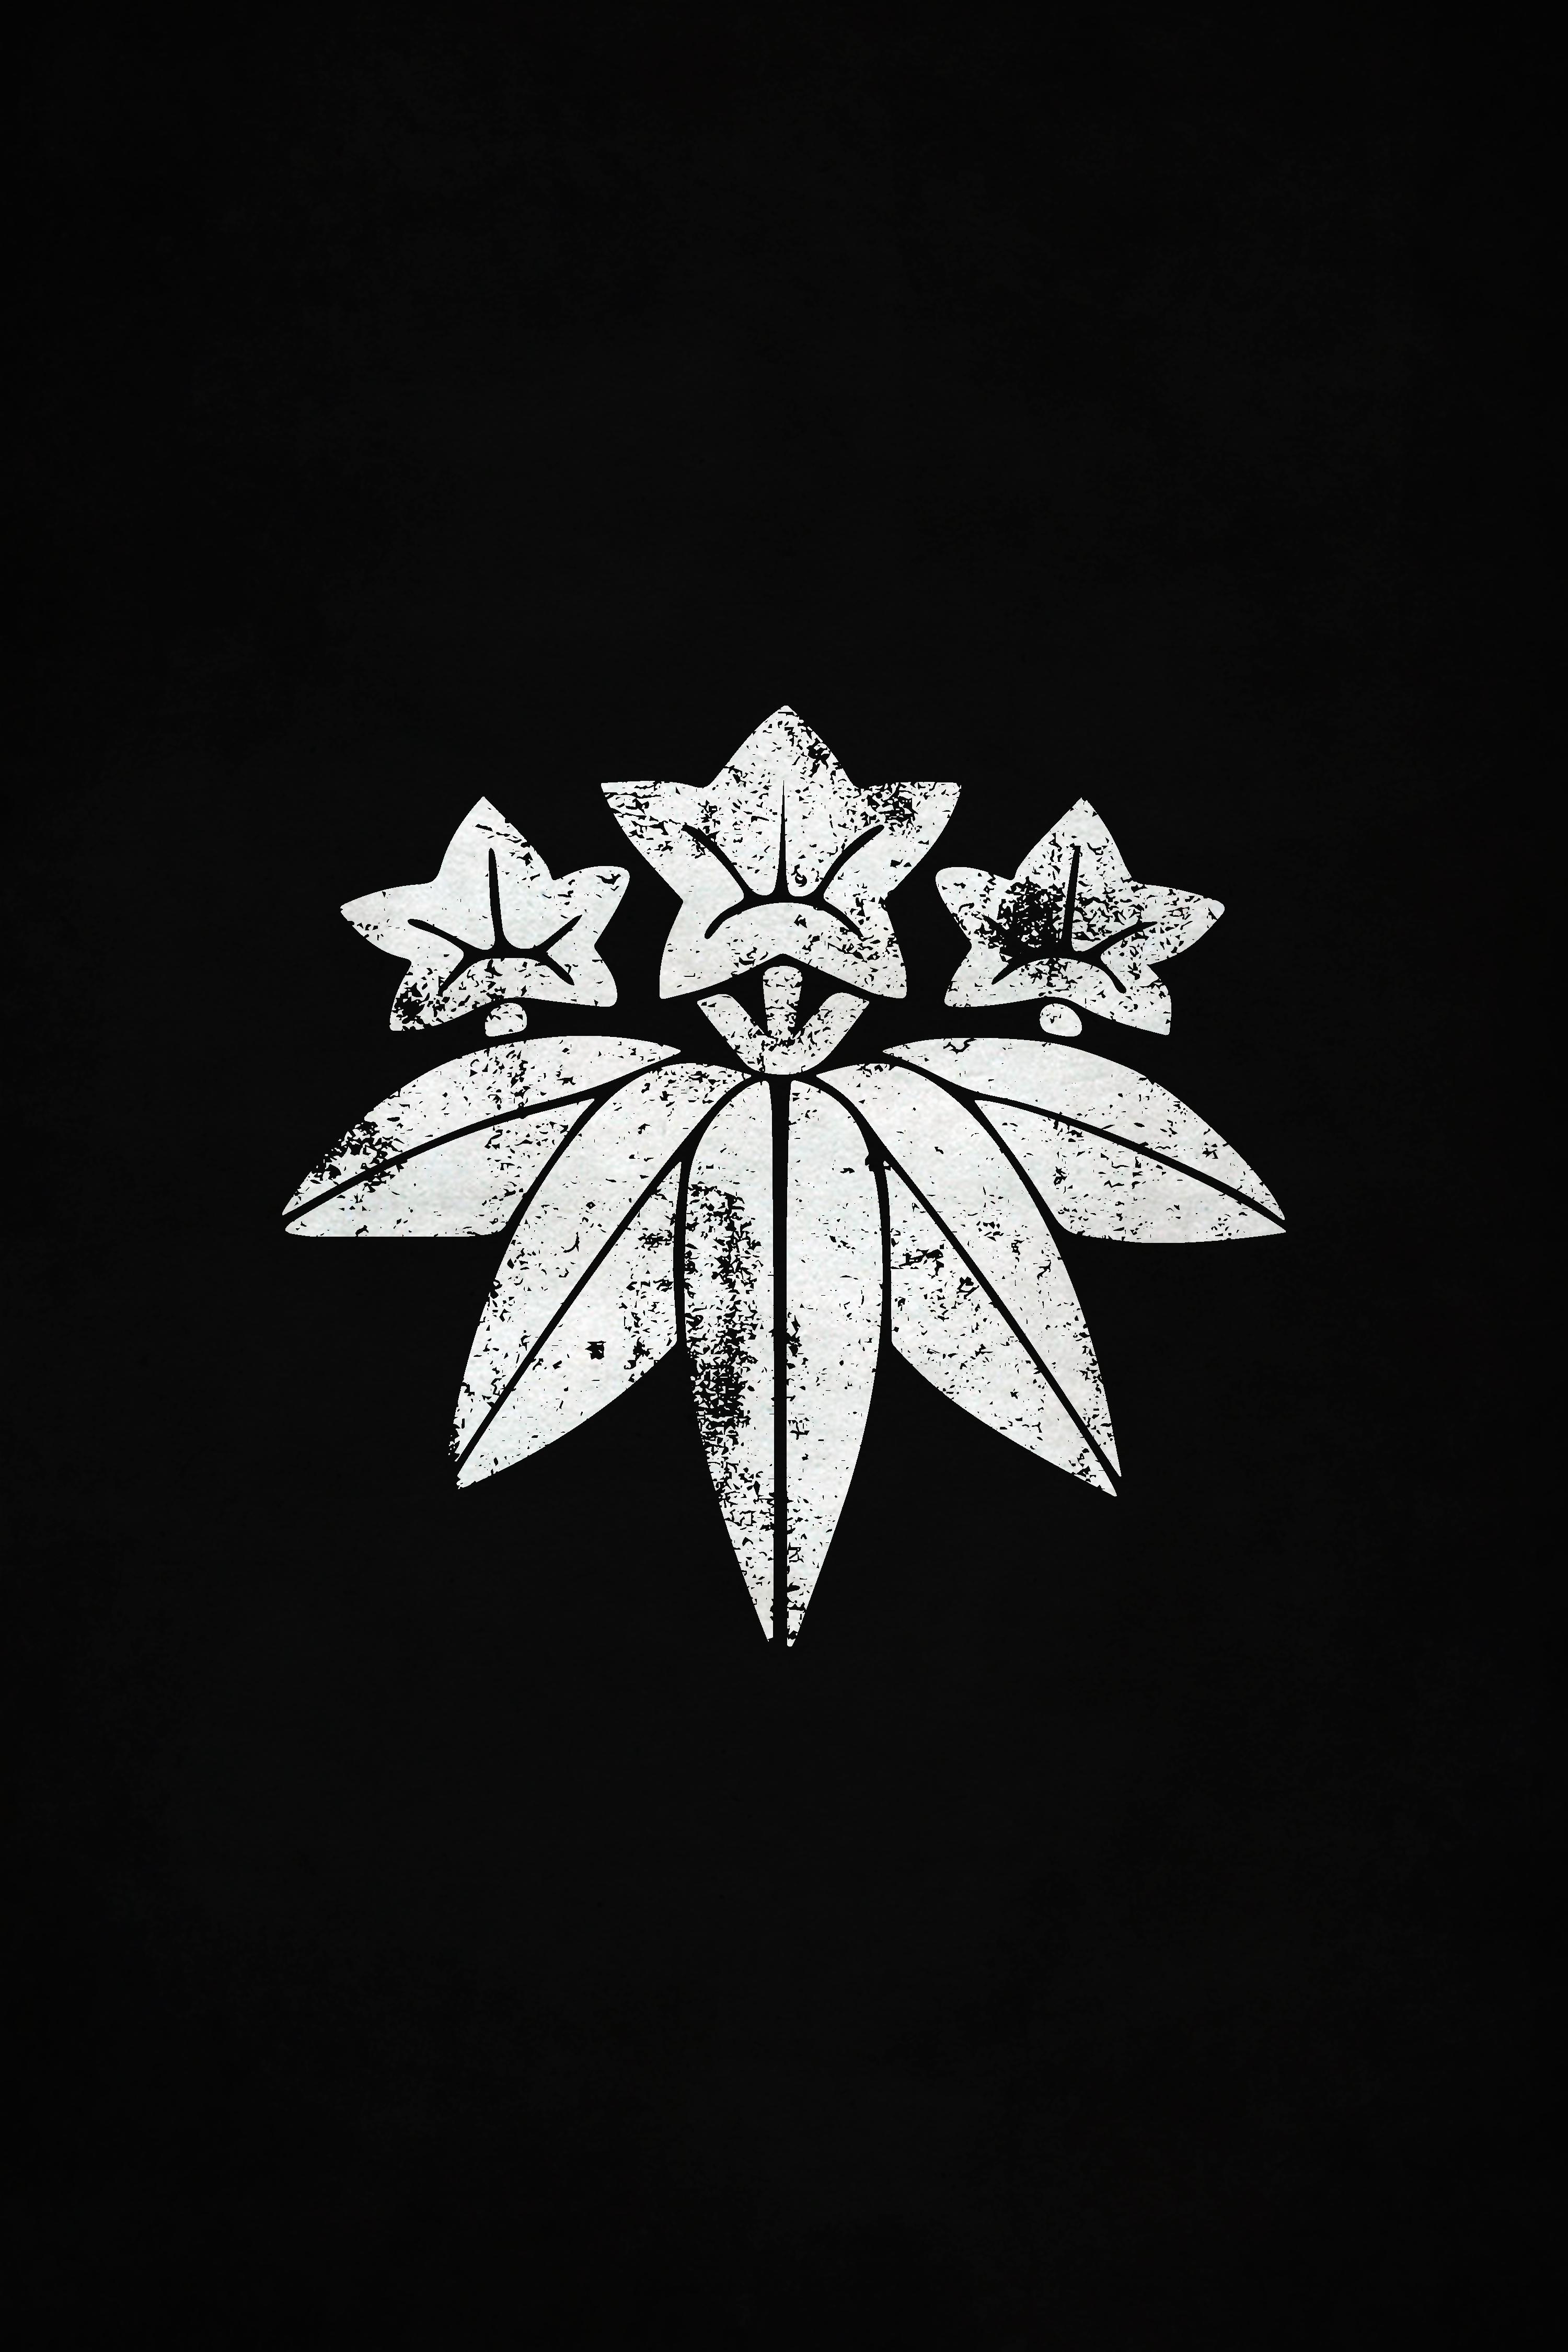 Minamoto Clan White Mon Distressed Gentian Flower Heian Period Clan